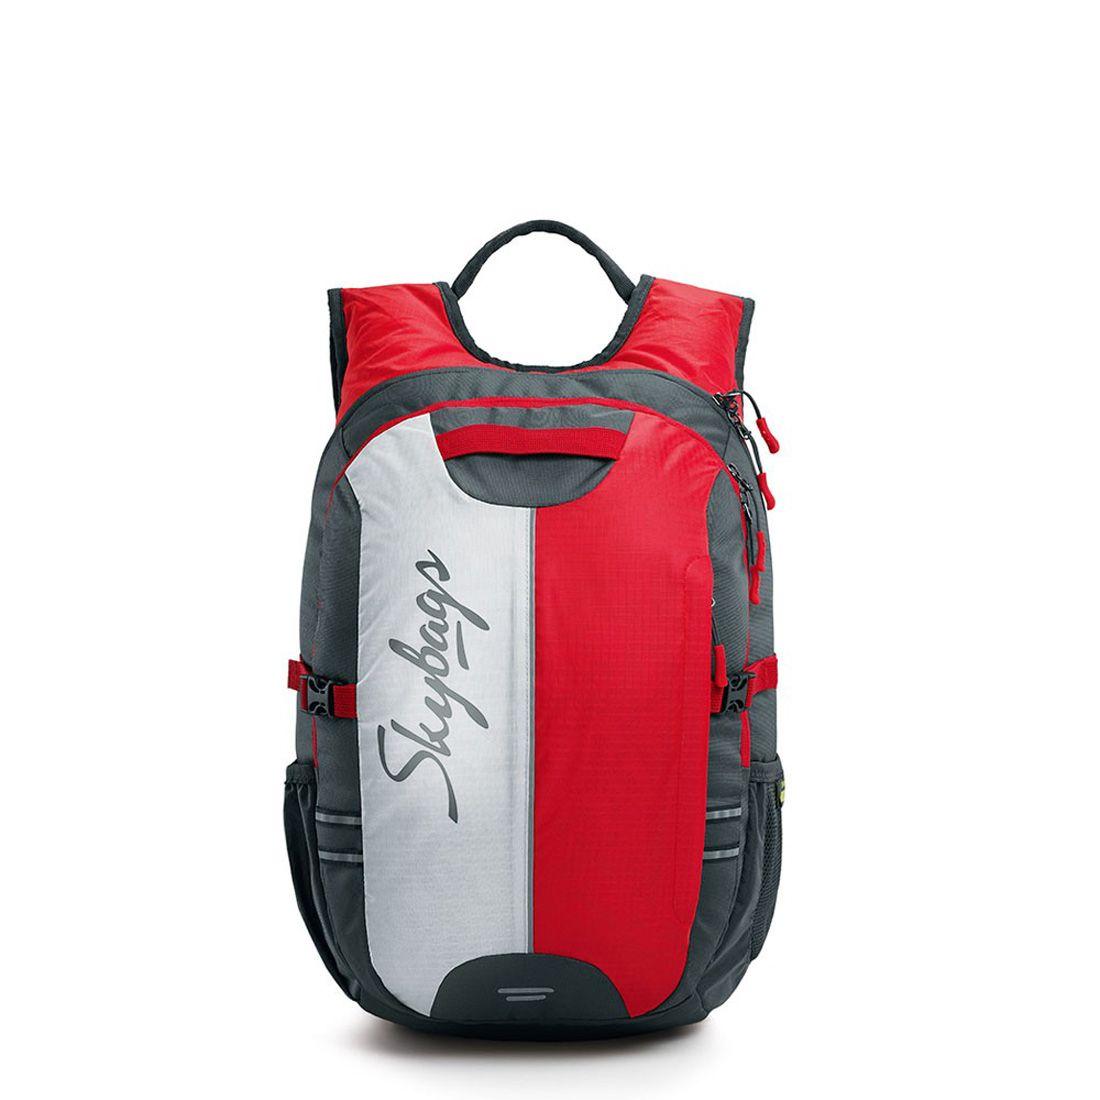 b379a1ecd2 Skybags Strider 03 Red